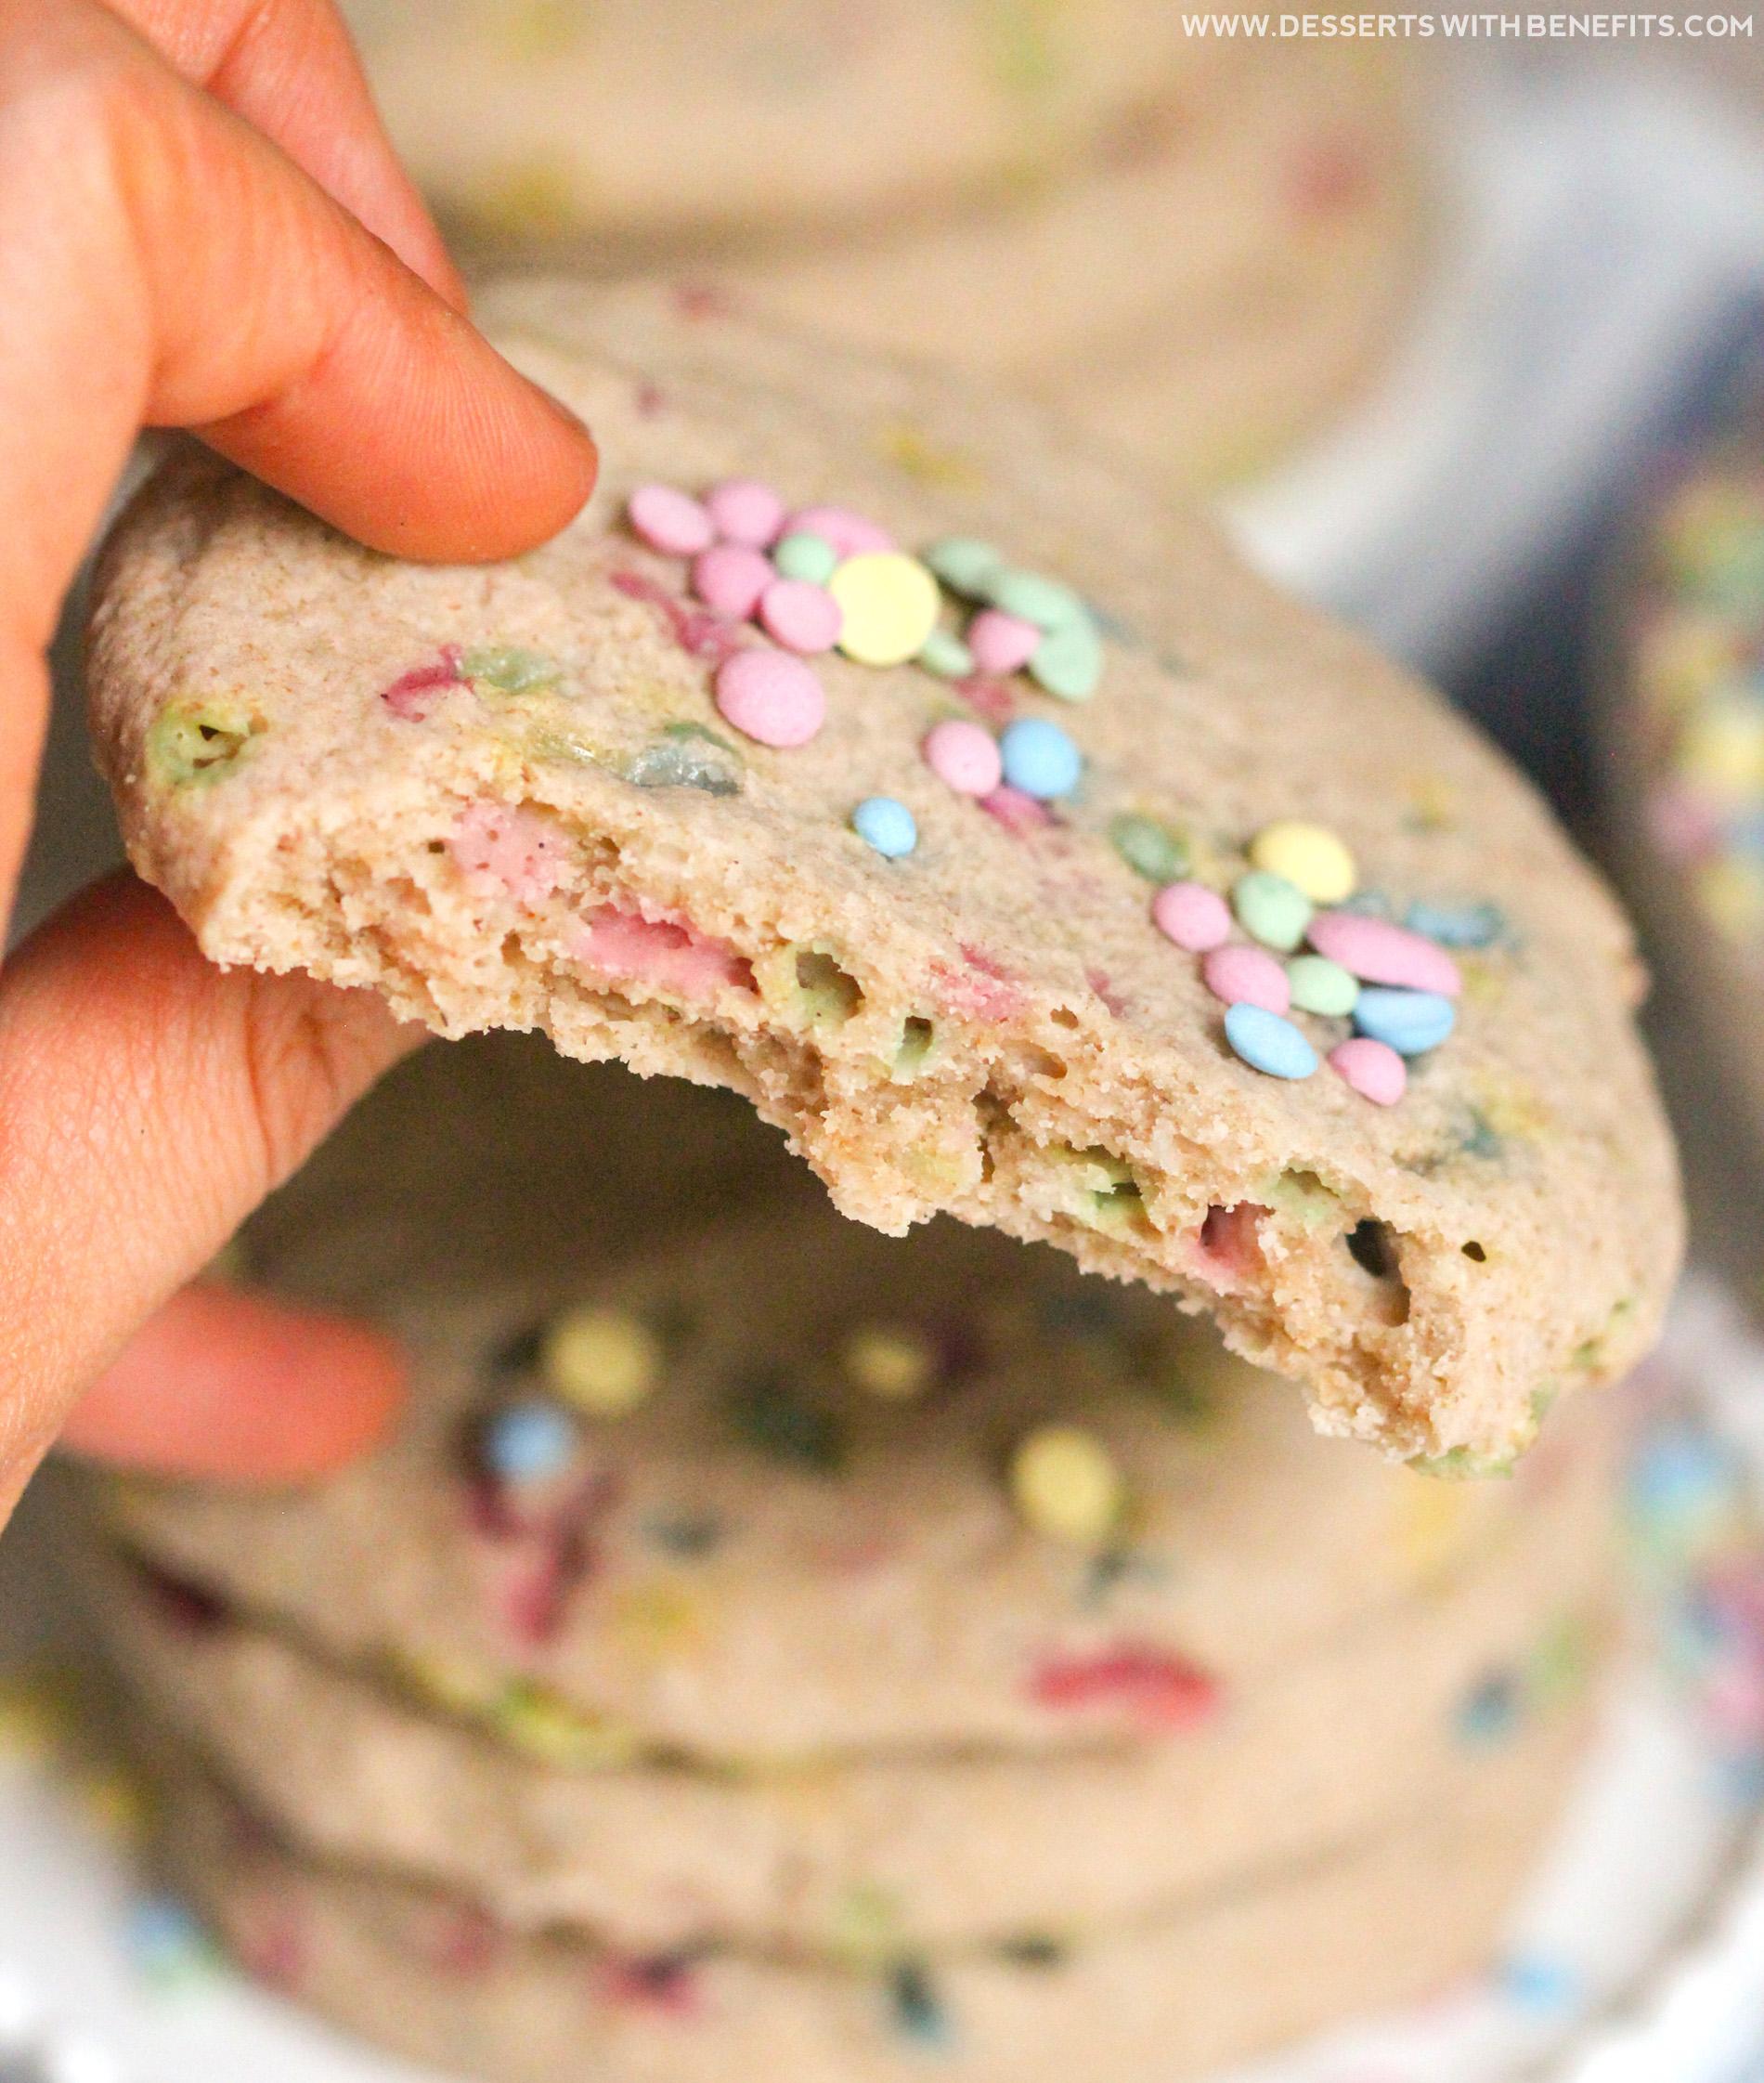 Healthy Funfetti Sugar Cookies recipe (all natural, sugar free, gluten free, dairy free, vegan) - Healthy Dessert Recipes at Desserts with Benefits